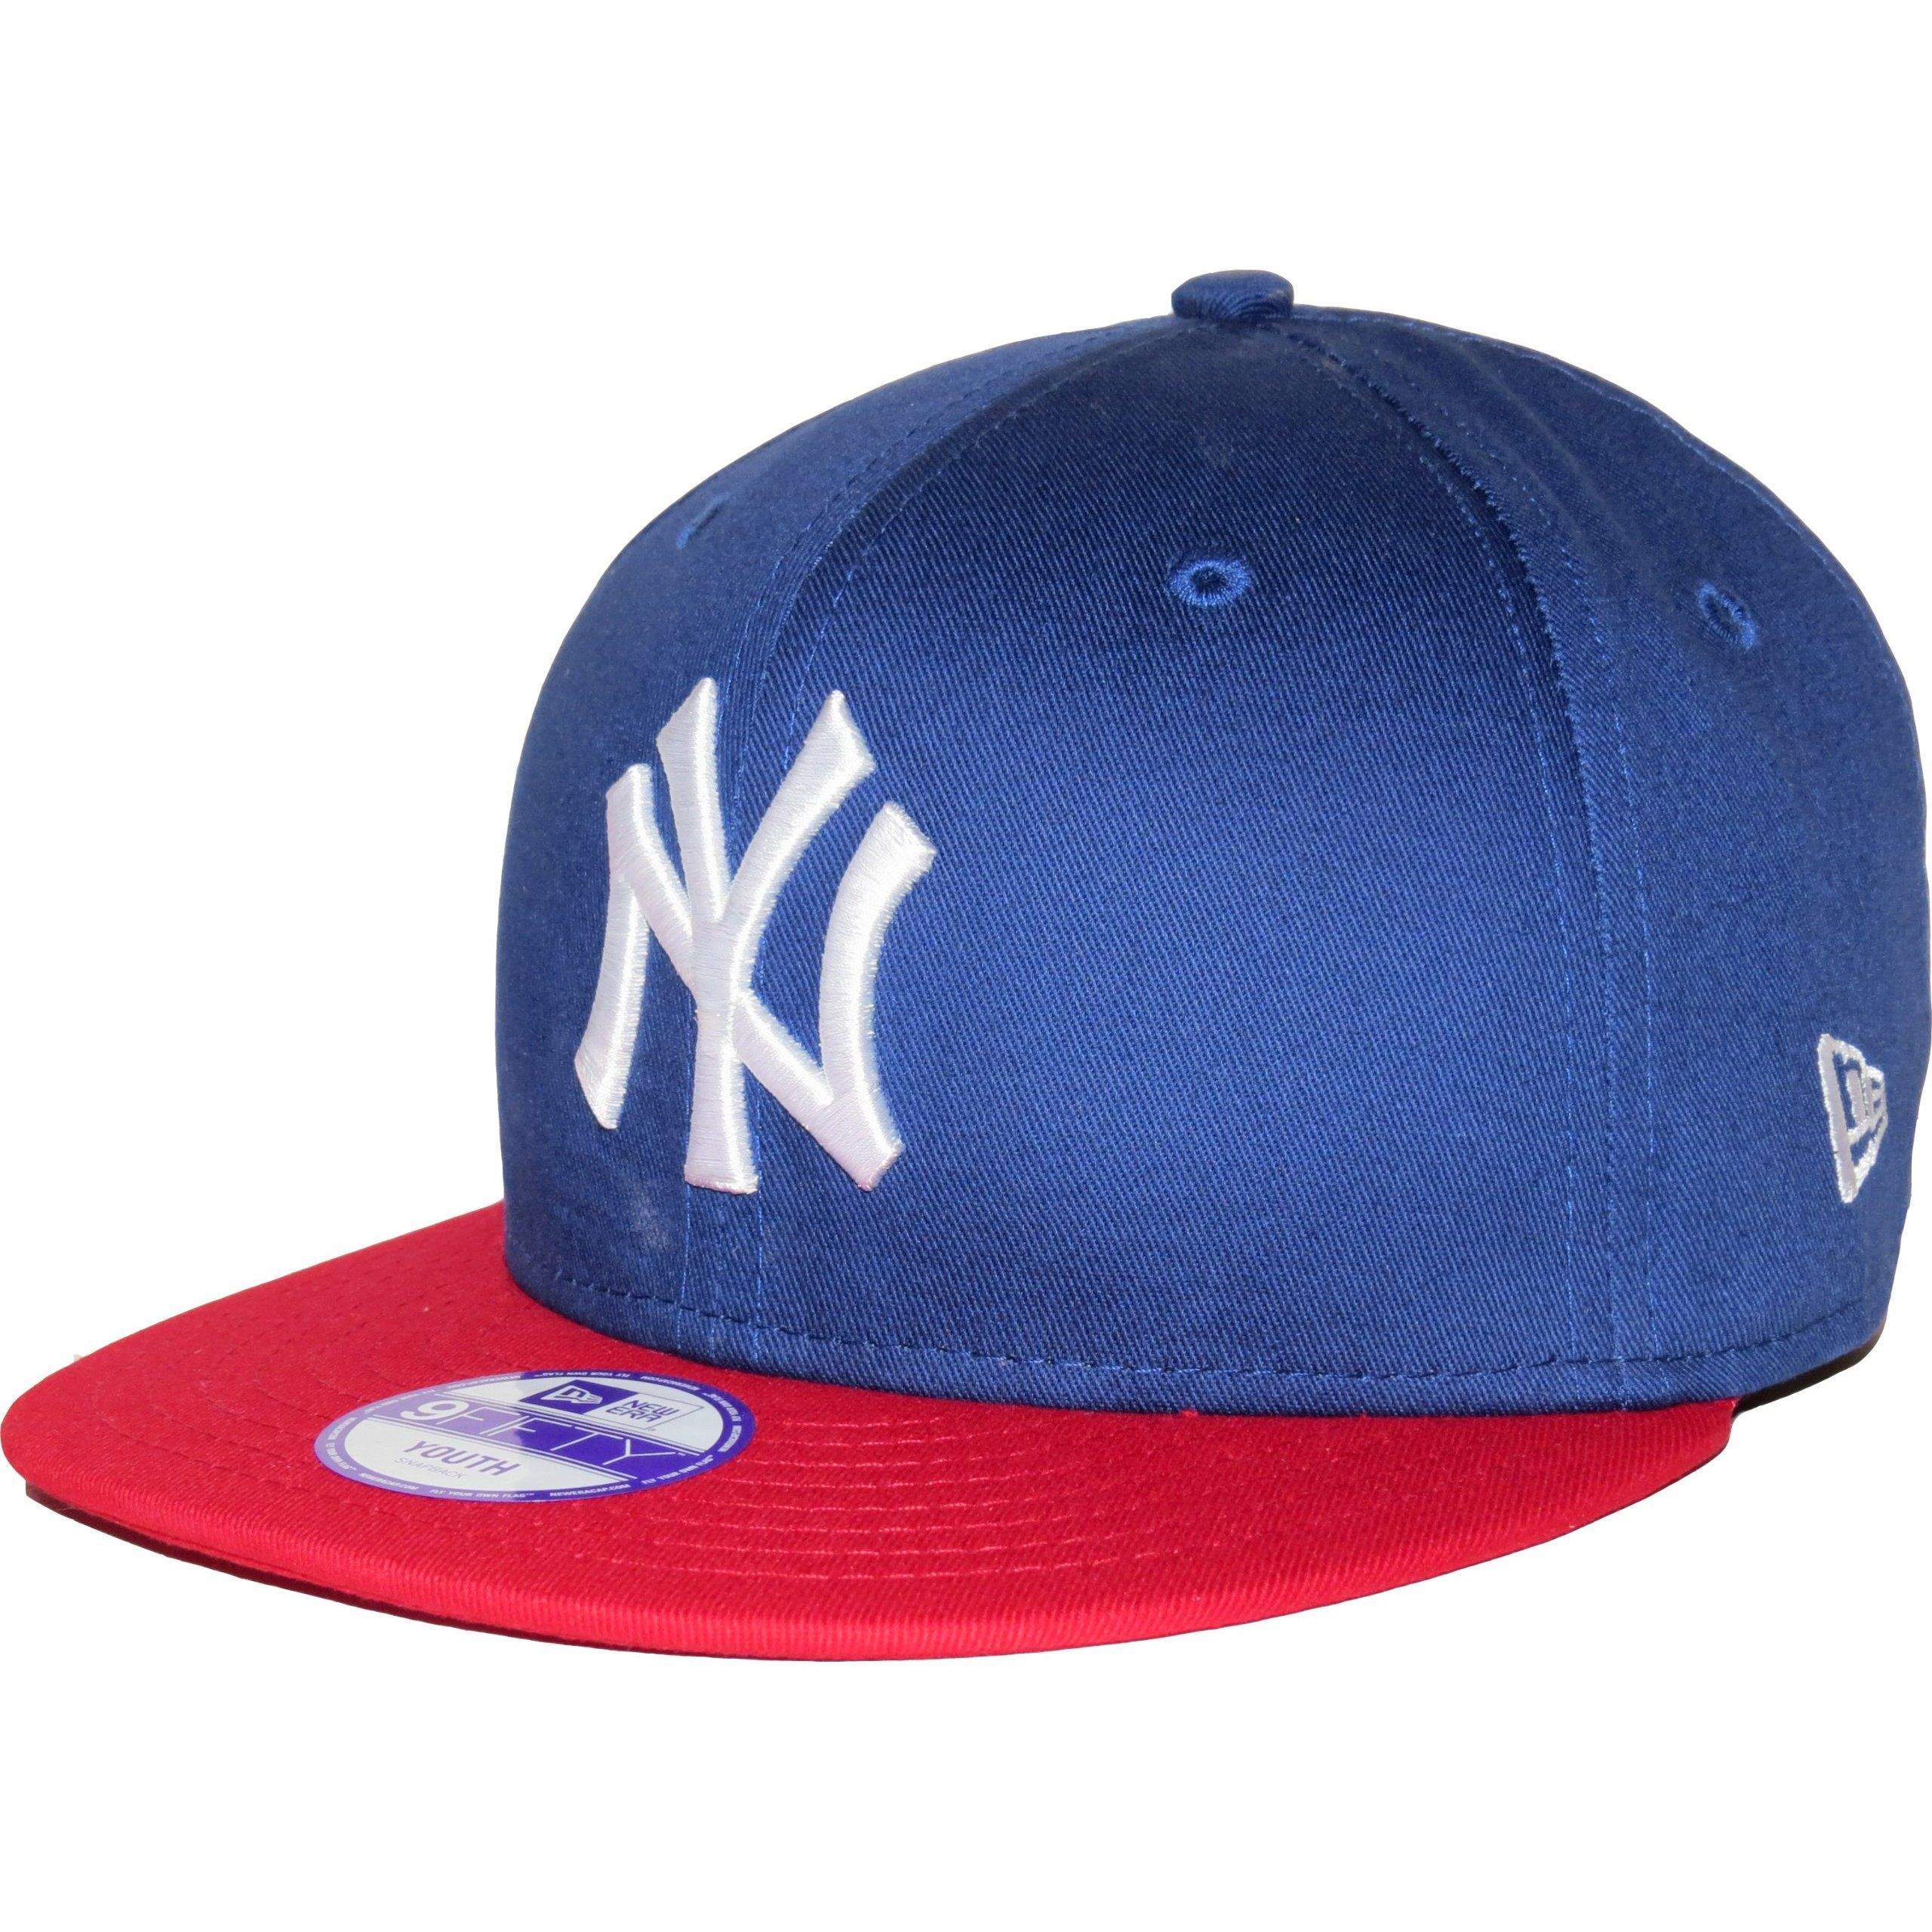 New Era 9fifty Kids Cotton Block Ny Yankees Blue Red Snapback Cap New Era New Era Cap Fitted Baseball Caps New Era